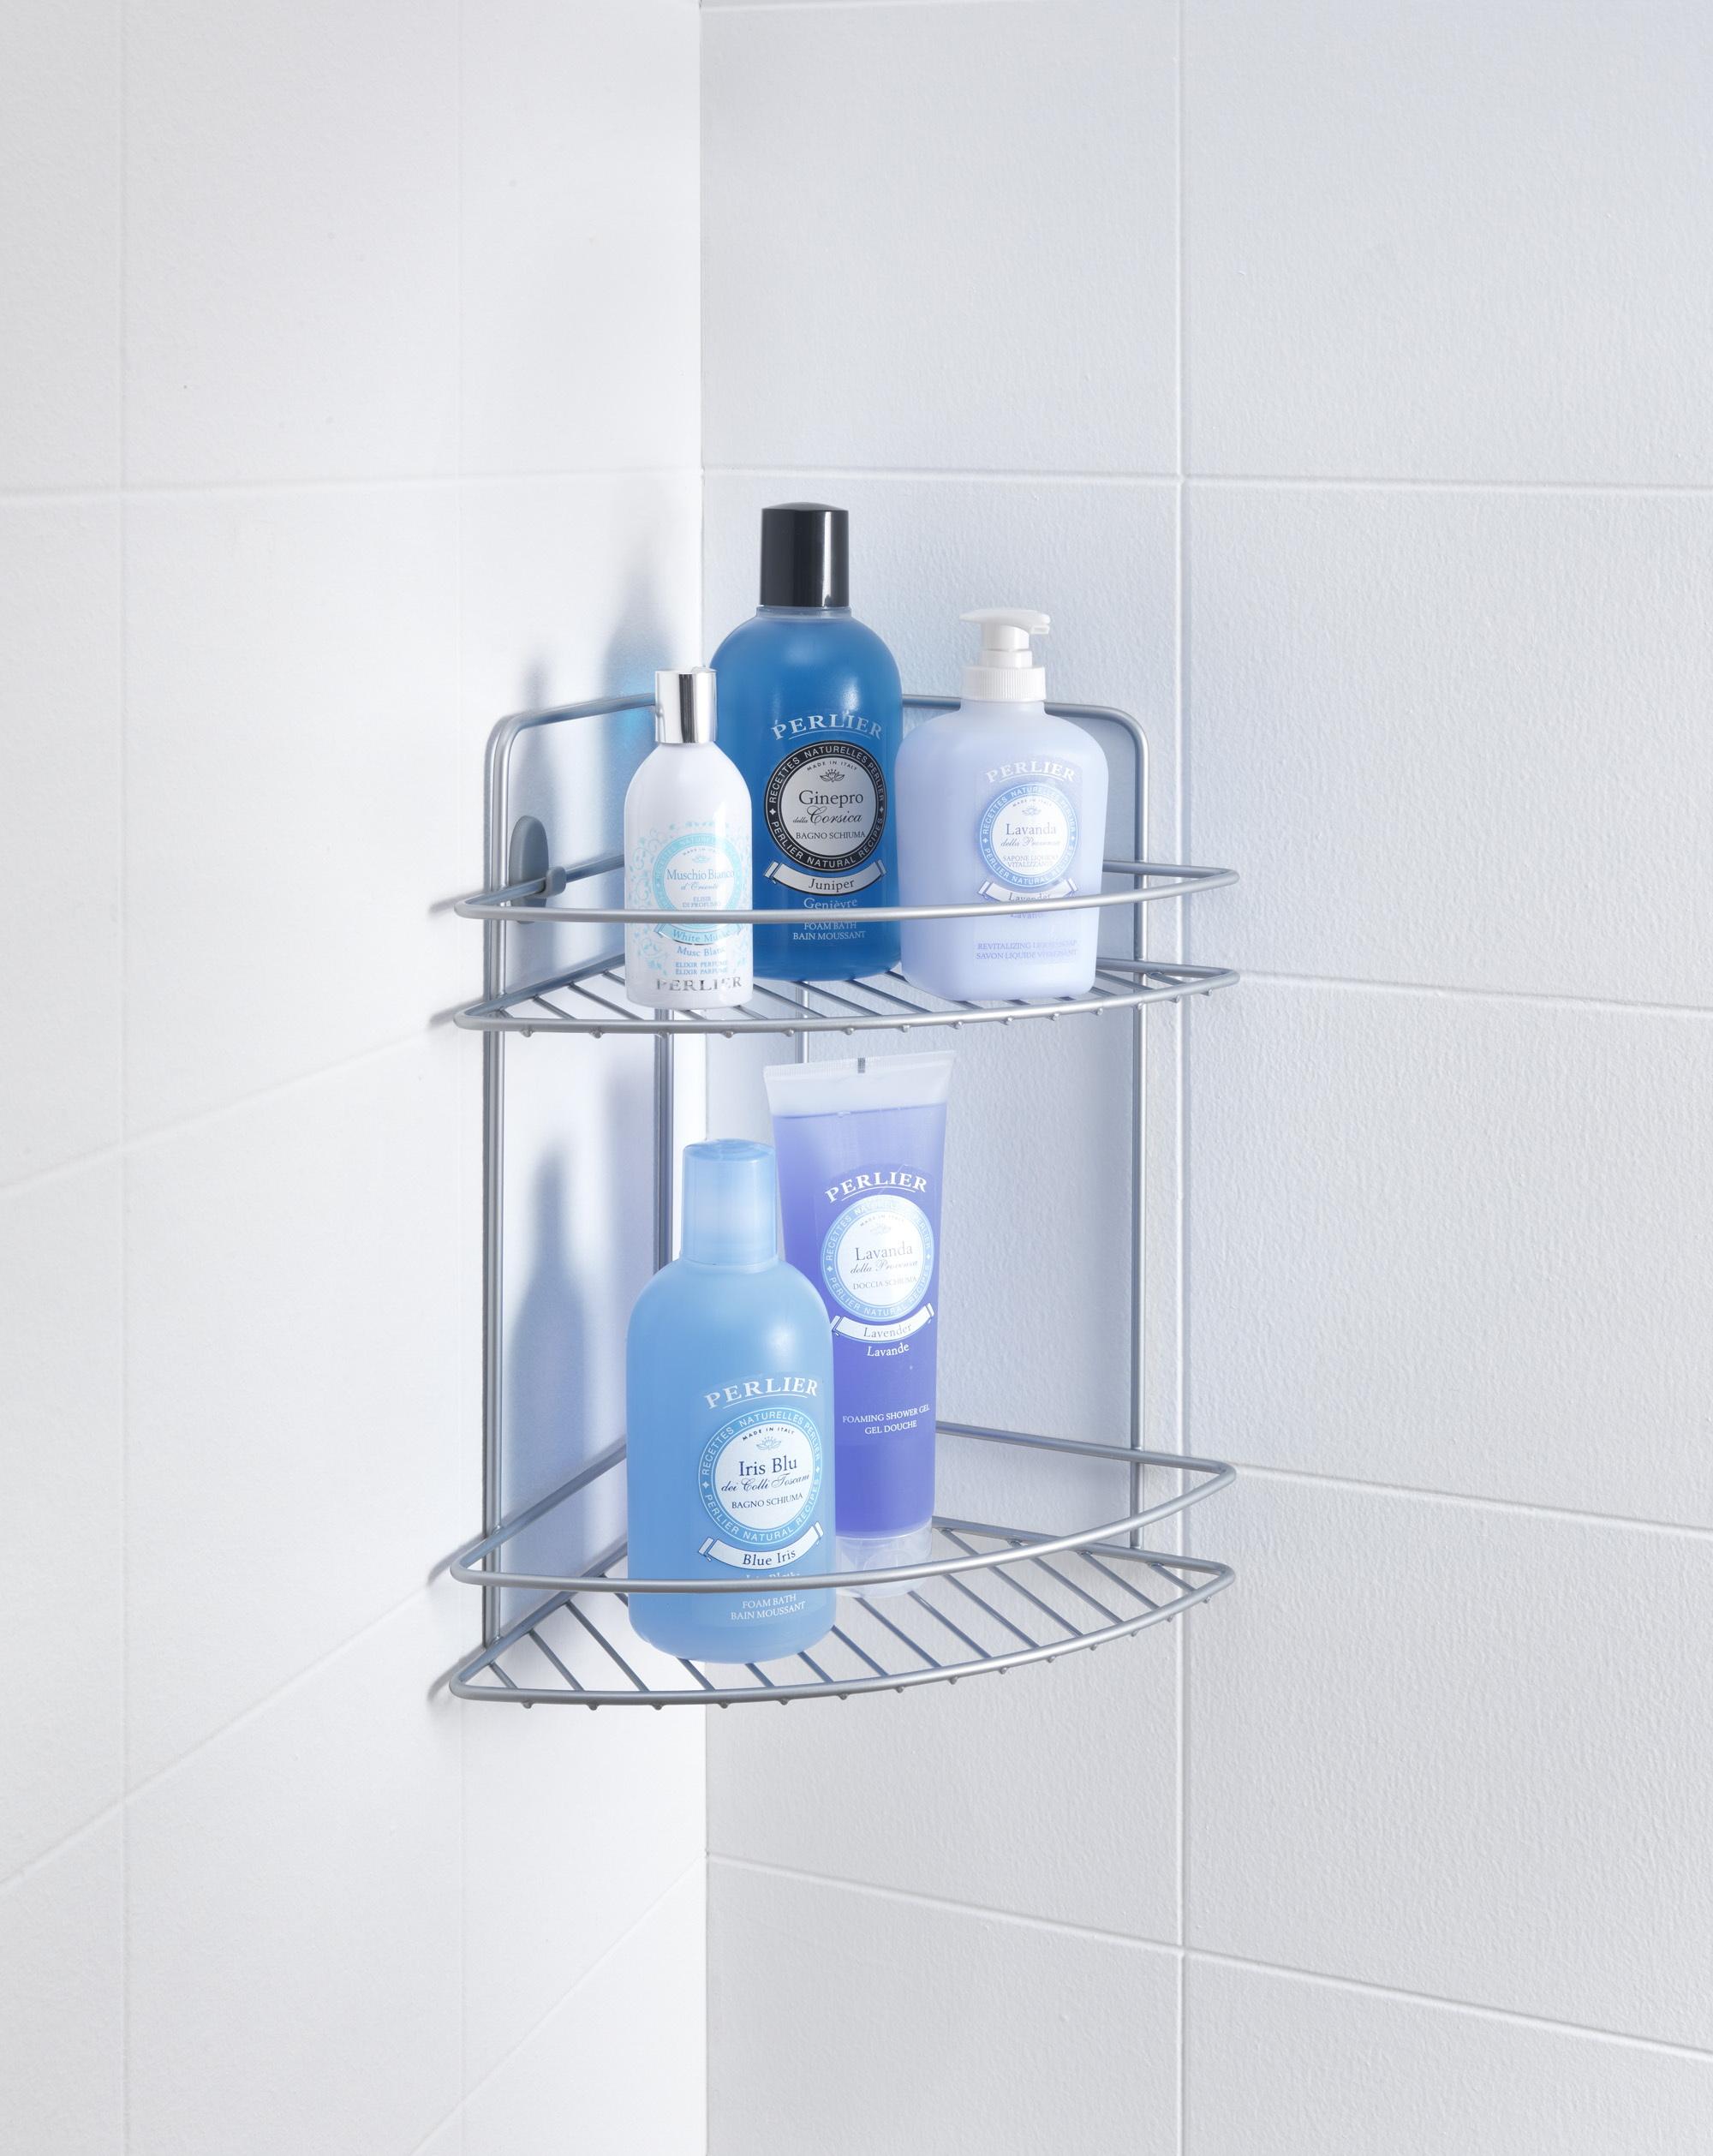 Полка MetaltexАксессуары для ванной комнаты<br>Назначение аксессуара: полка,<br>Материал: металл,<br>Высота: 350,<br>Ширина: 230,<br>Глубина: 230,<br>Вес нетто: 0.9<br>